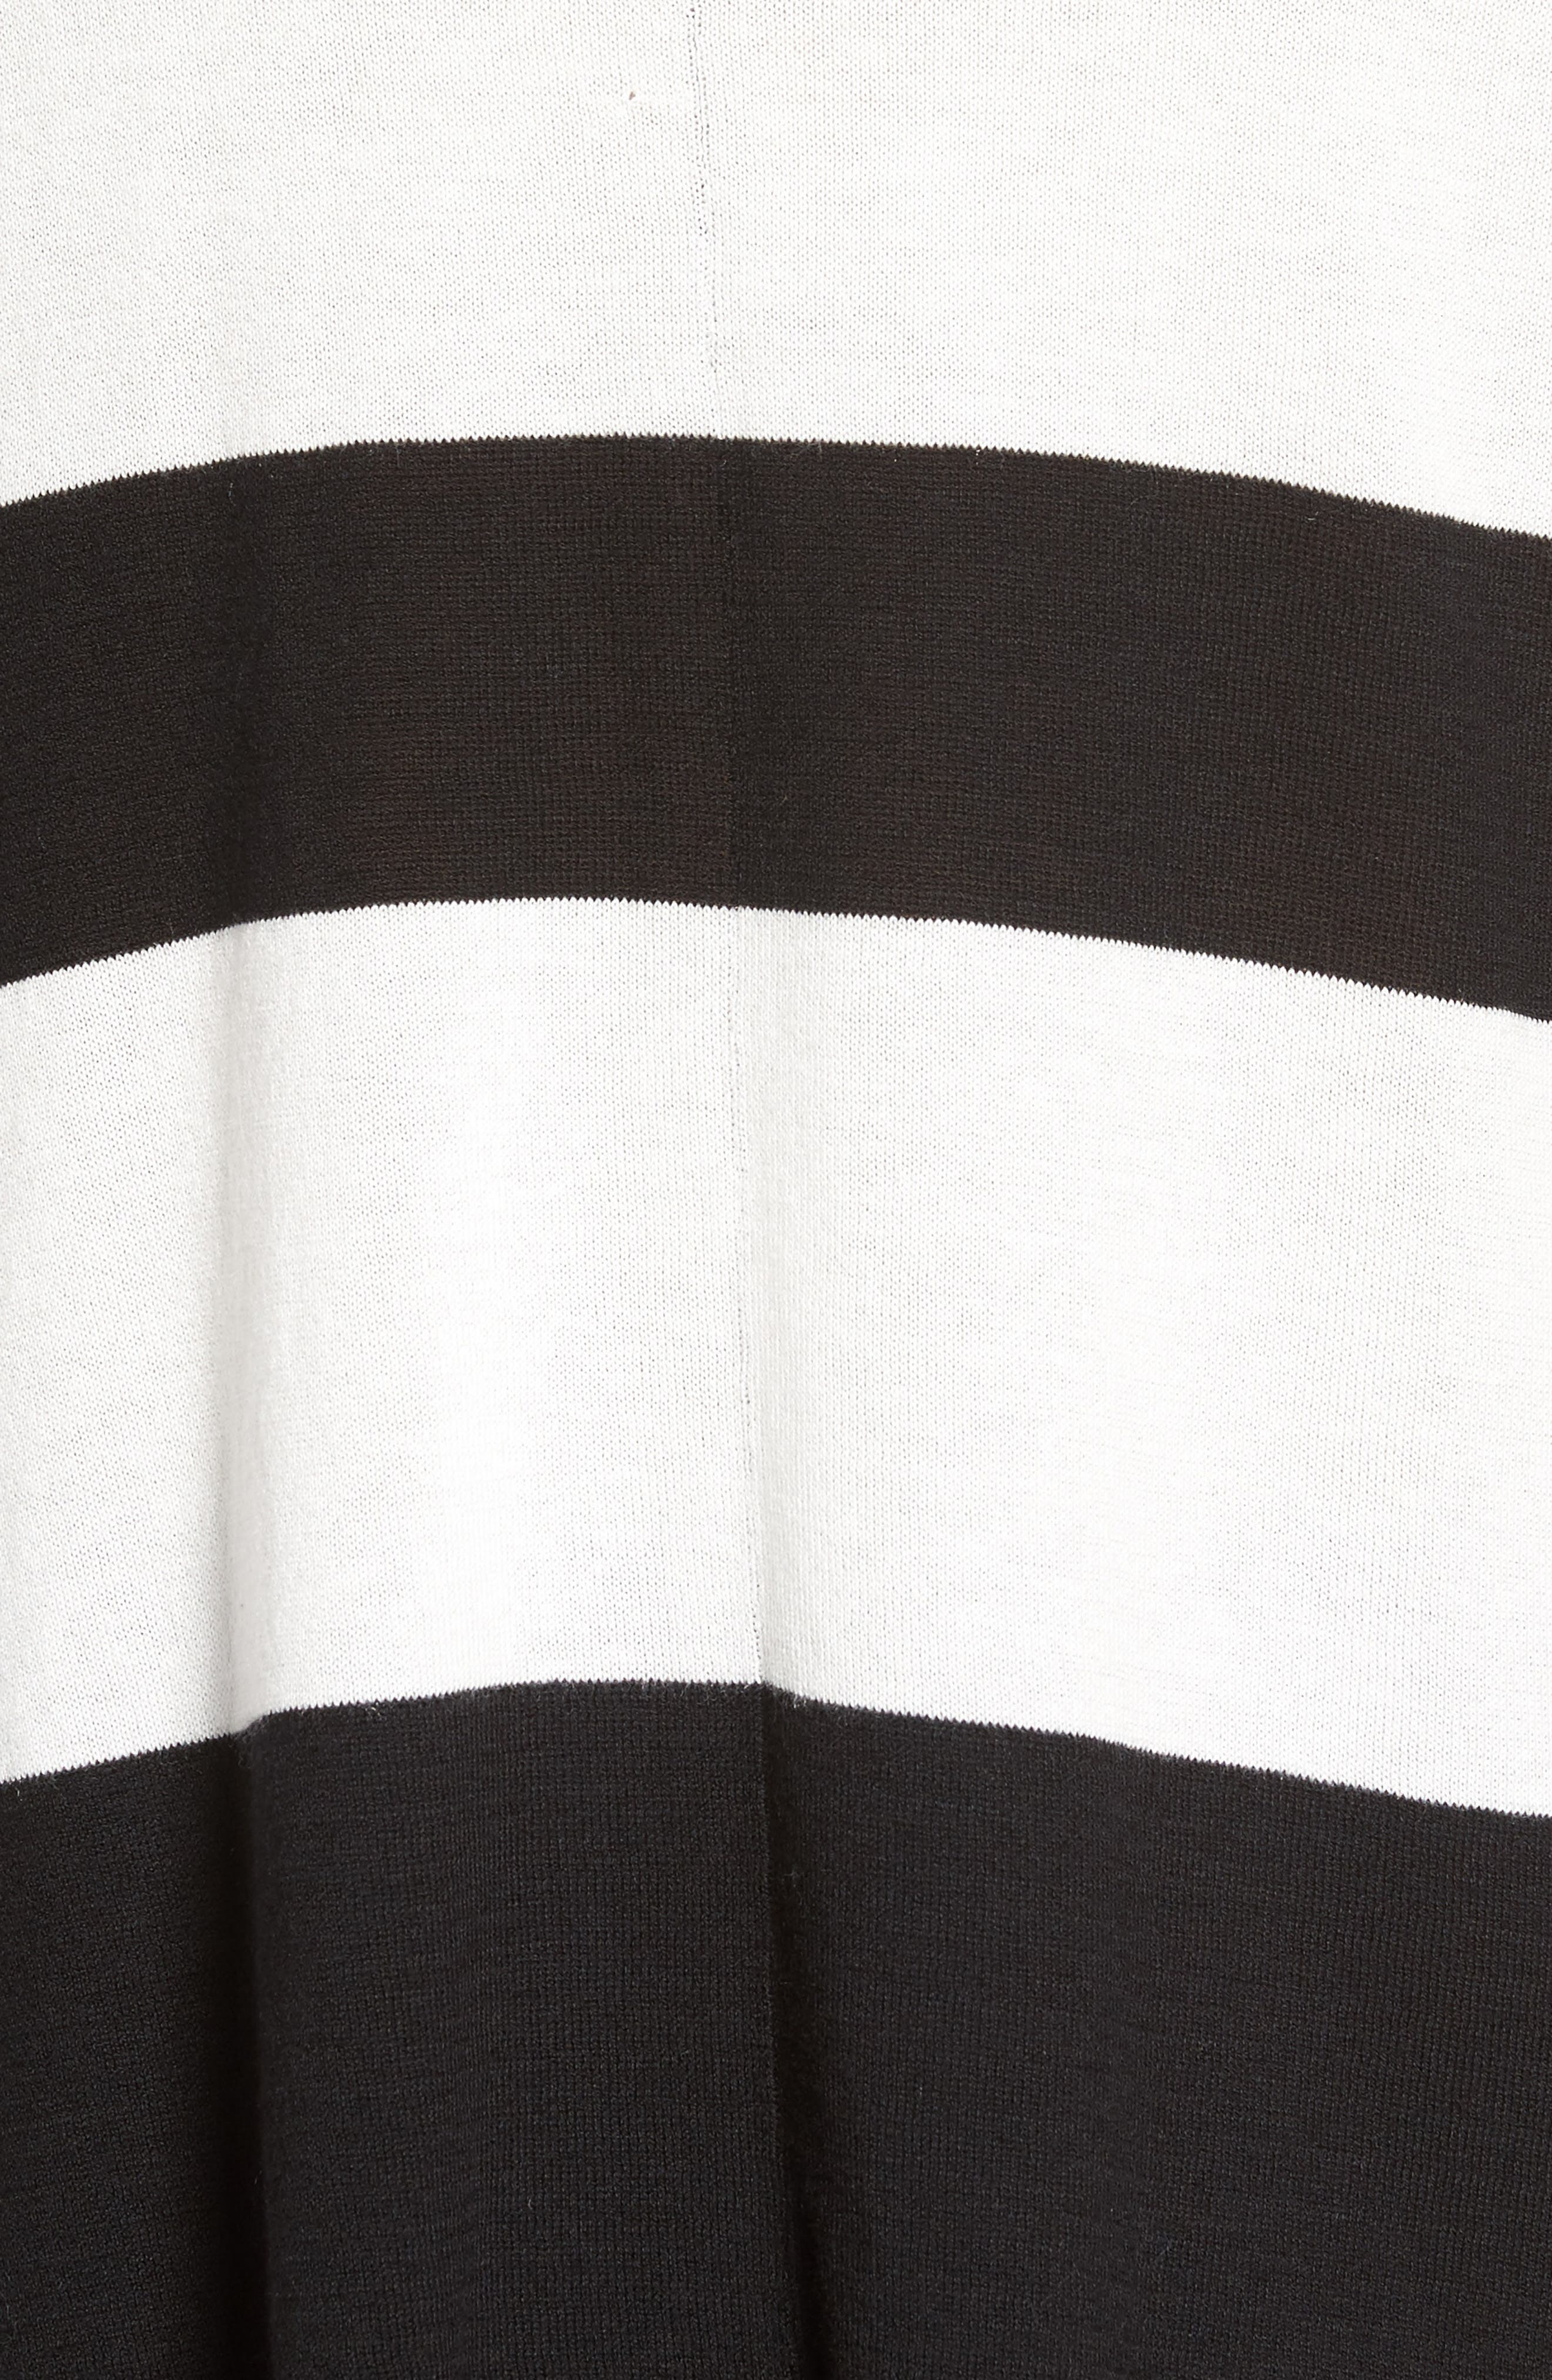 Wide Stripe Turtleneck Sweater,                             Alternate thumbnail 5, color,                             Black Cream